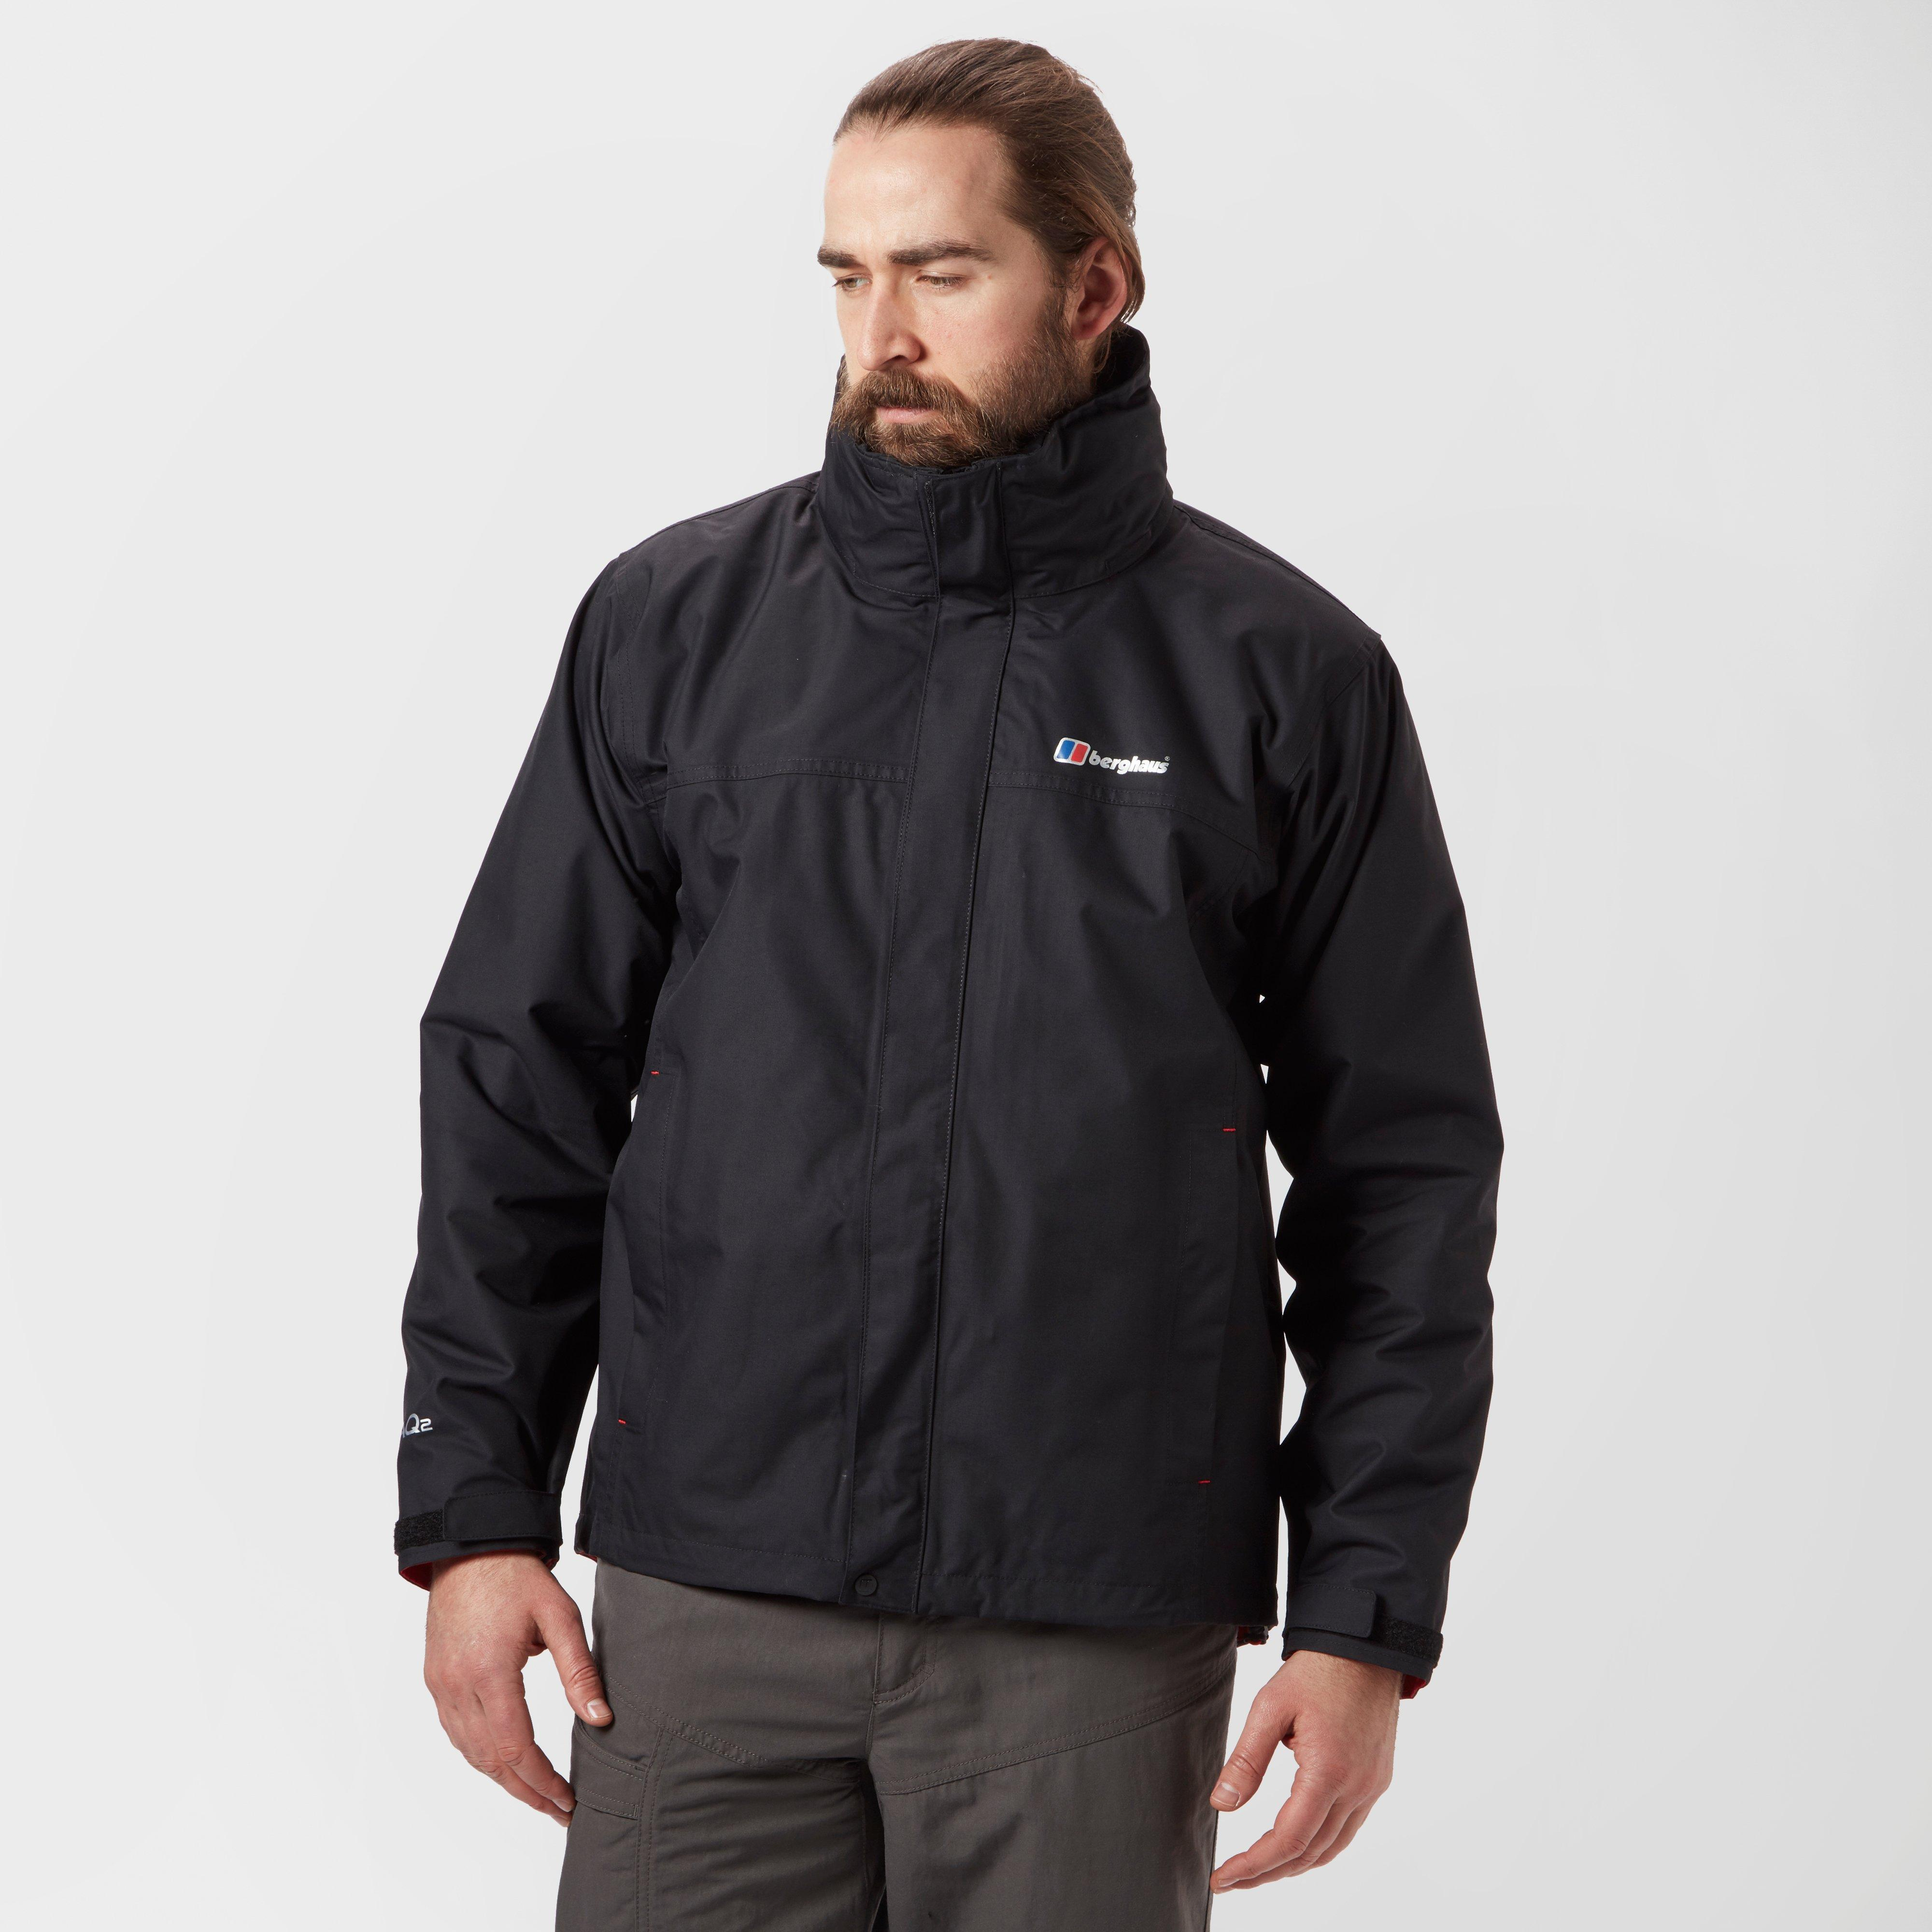 Men's 3 in 1 Jackets & Coats | Millets